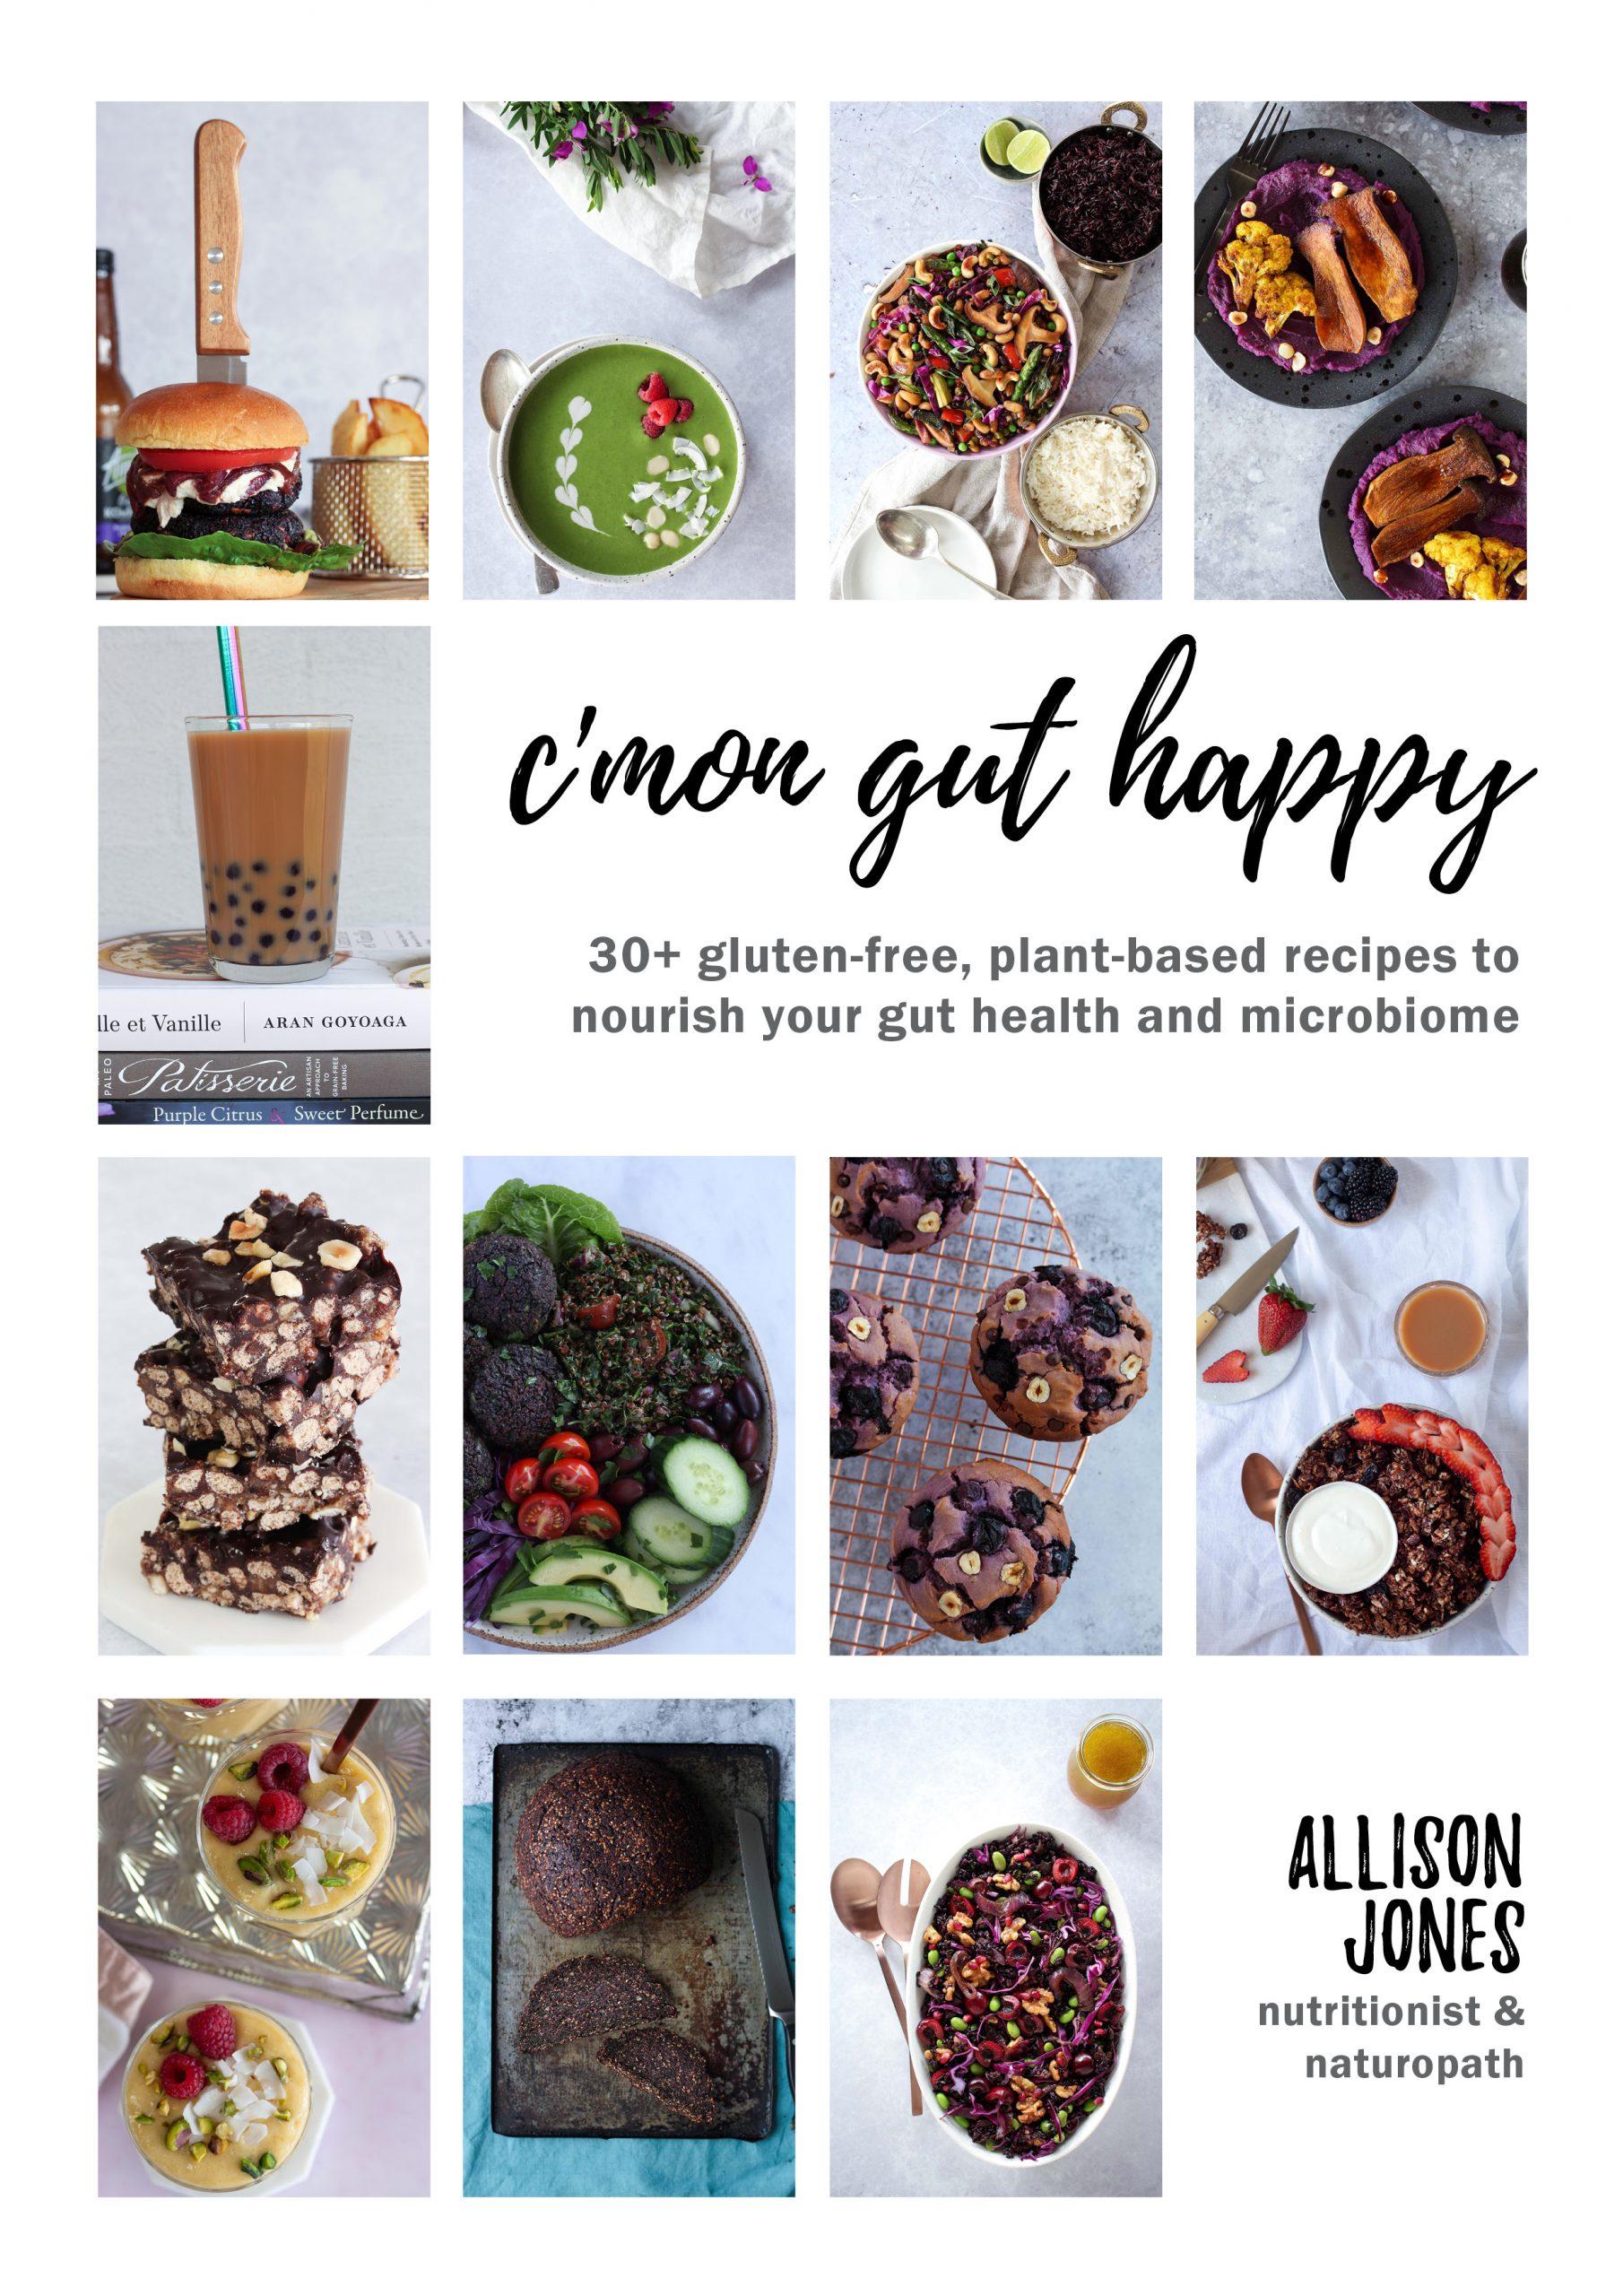 C'mon Gut Happy book cover